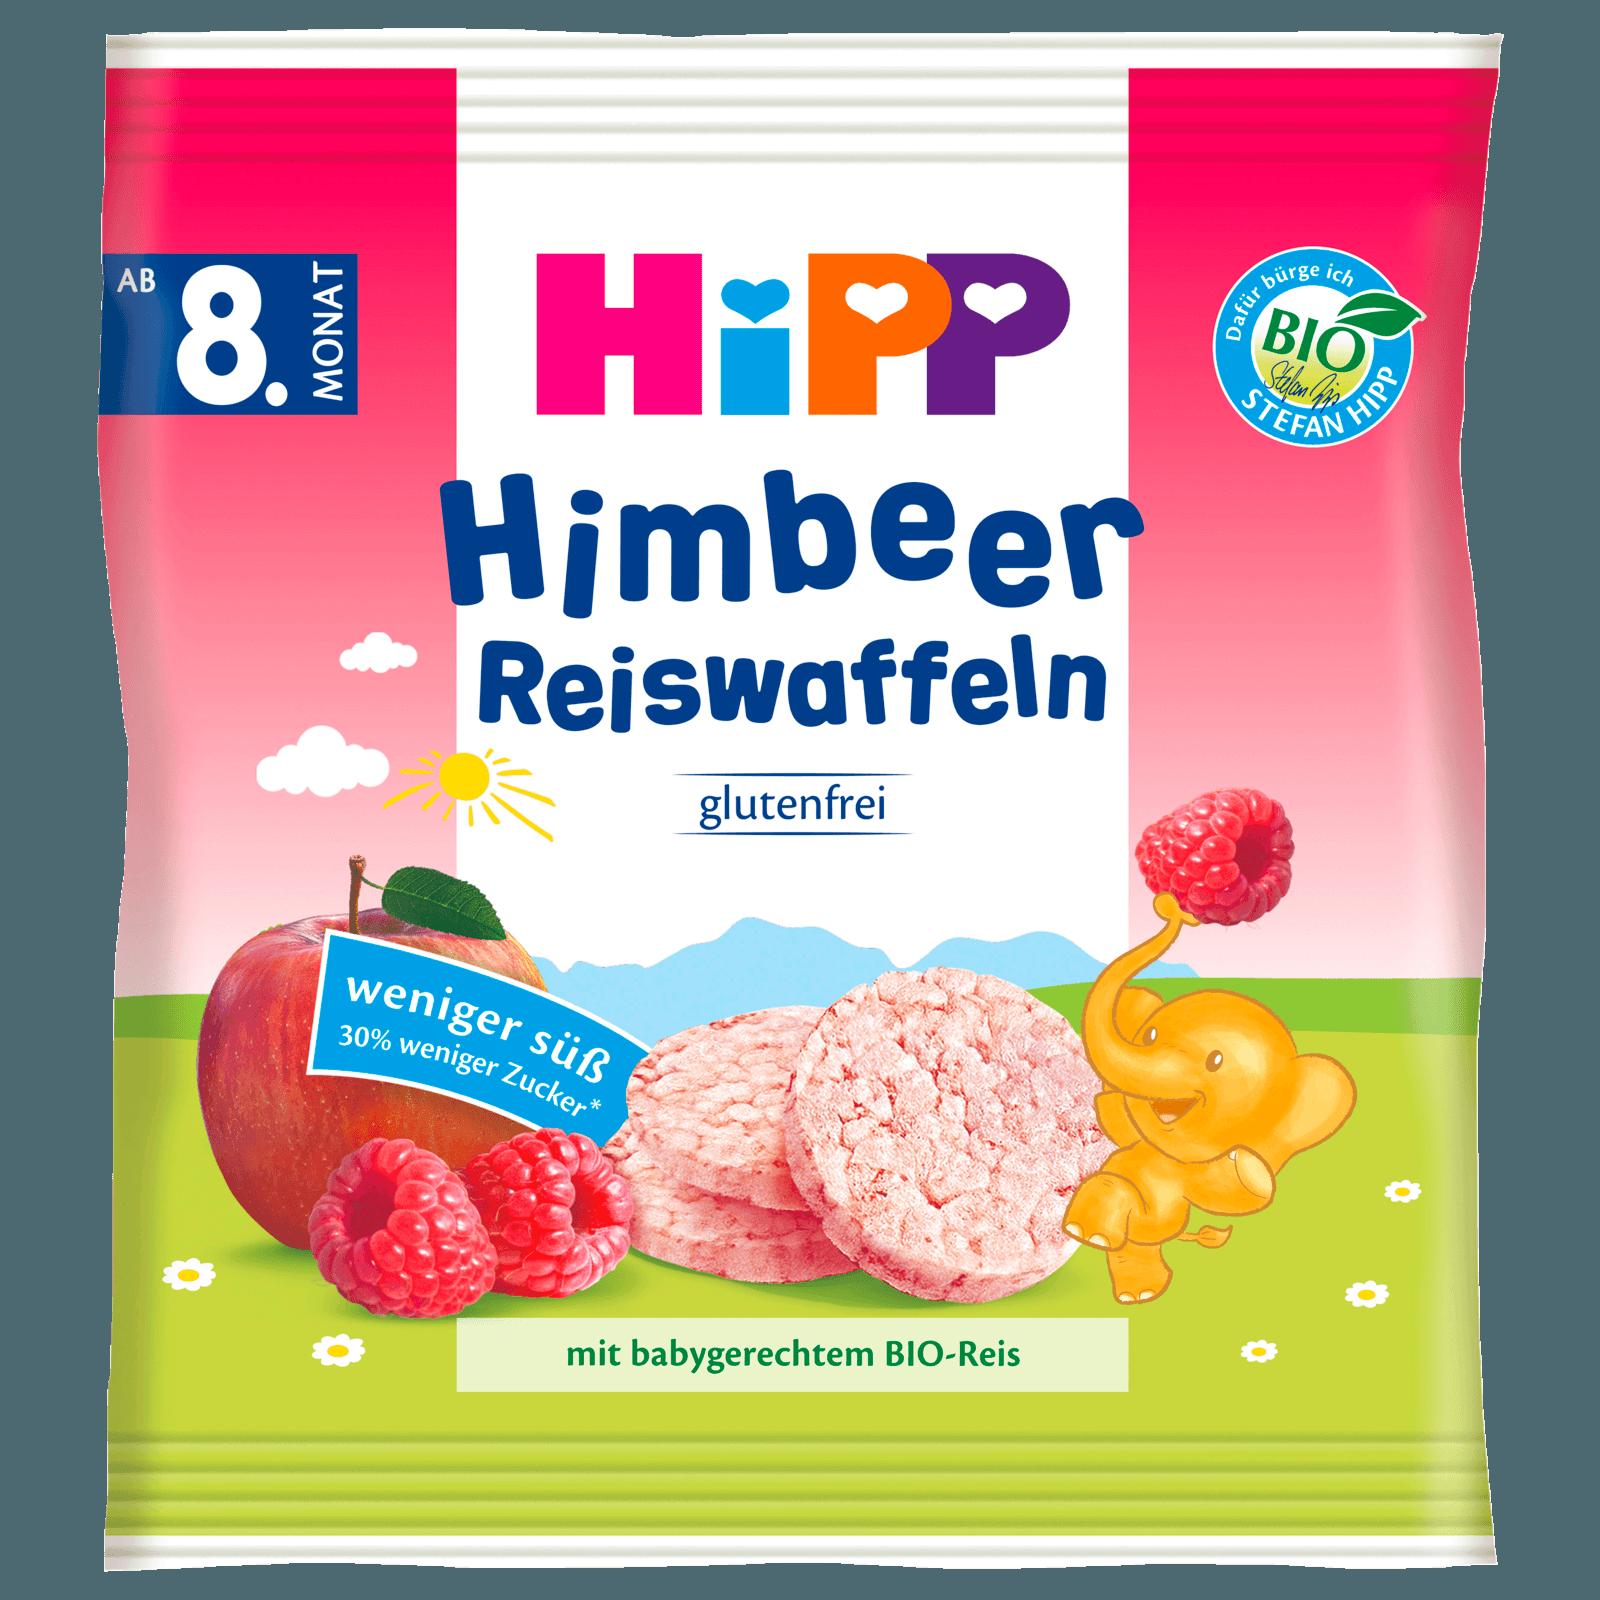 Hipp Knabberprodukte Himbeer Reiswaffeln ab dem 8. Monat 30g